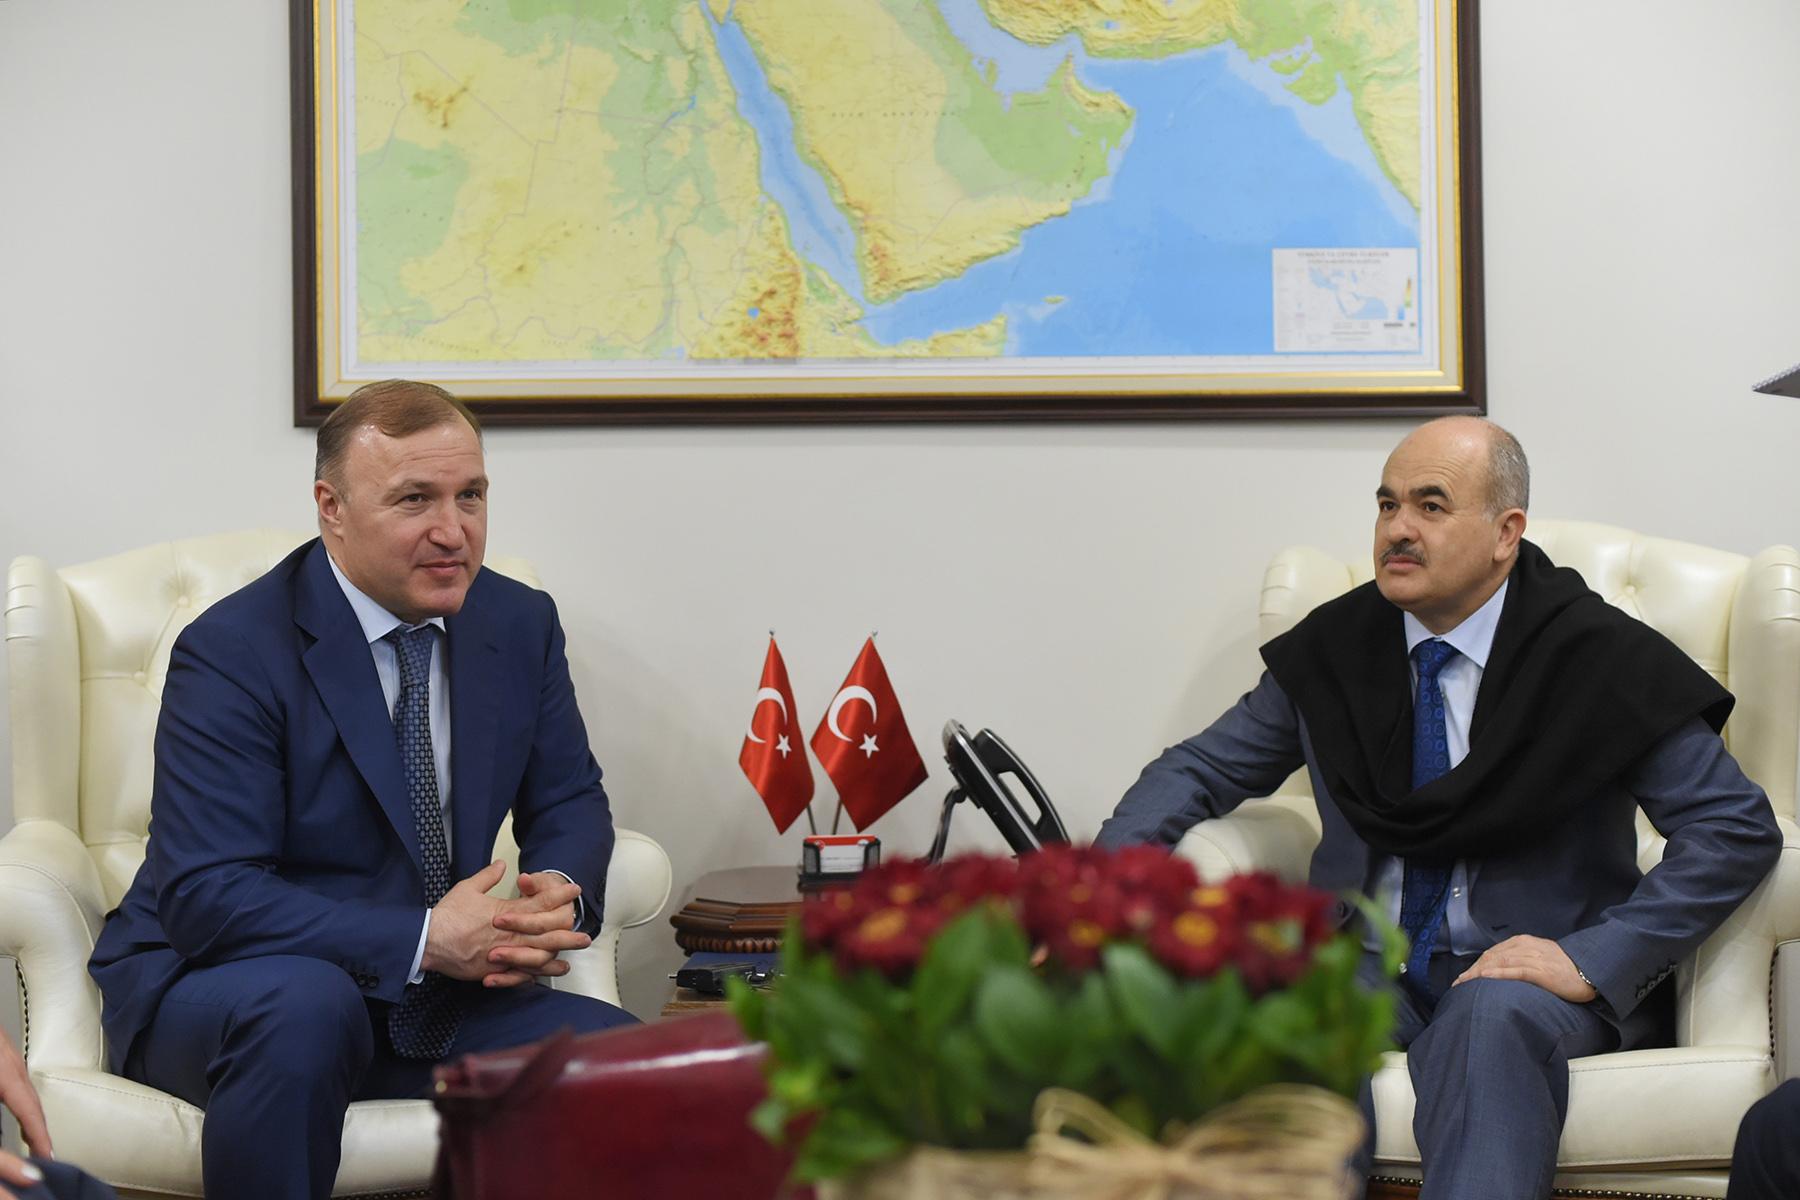 Глава Адыгеи провел встречу с губернатором провинции Дюздже